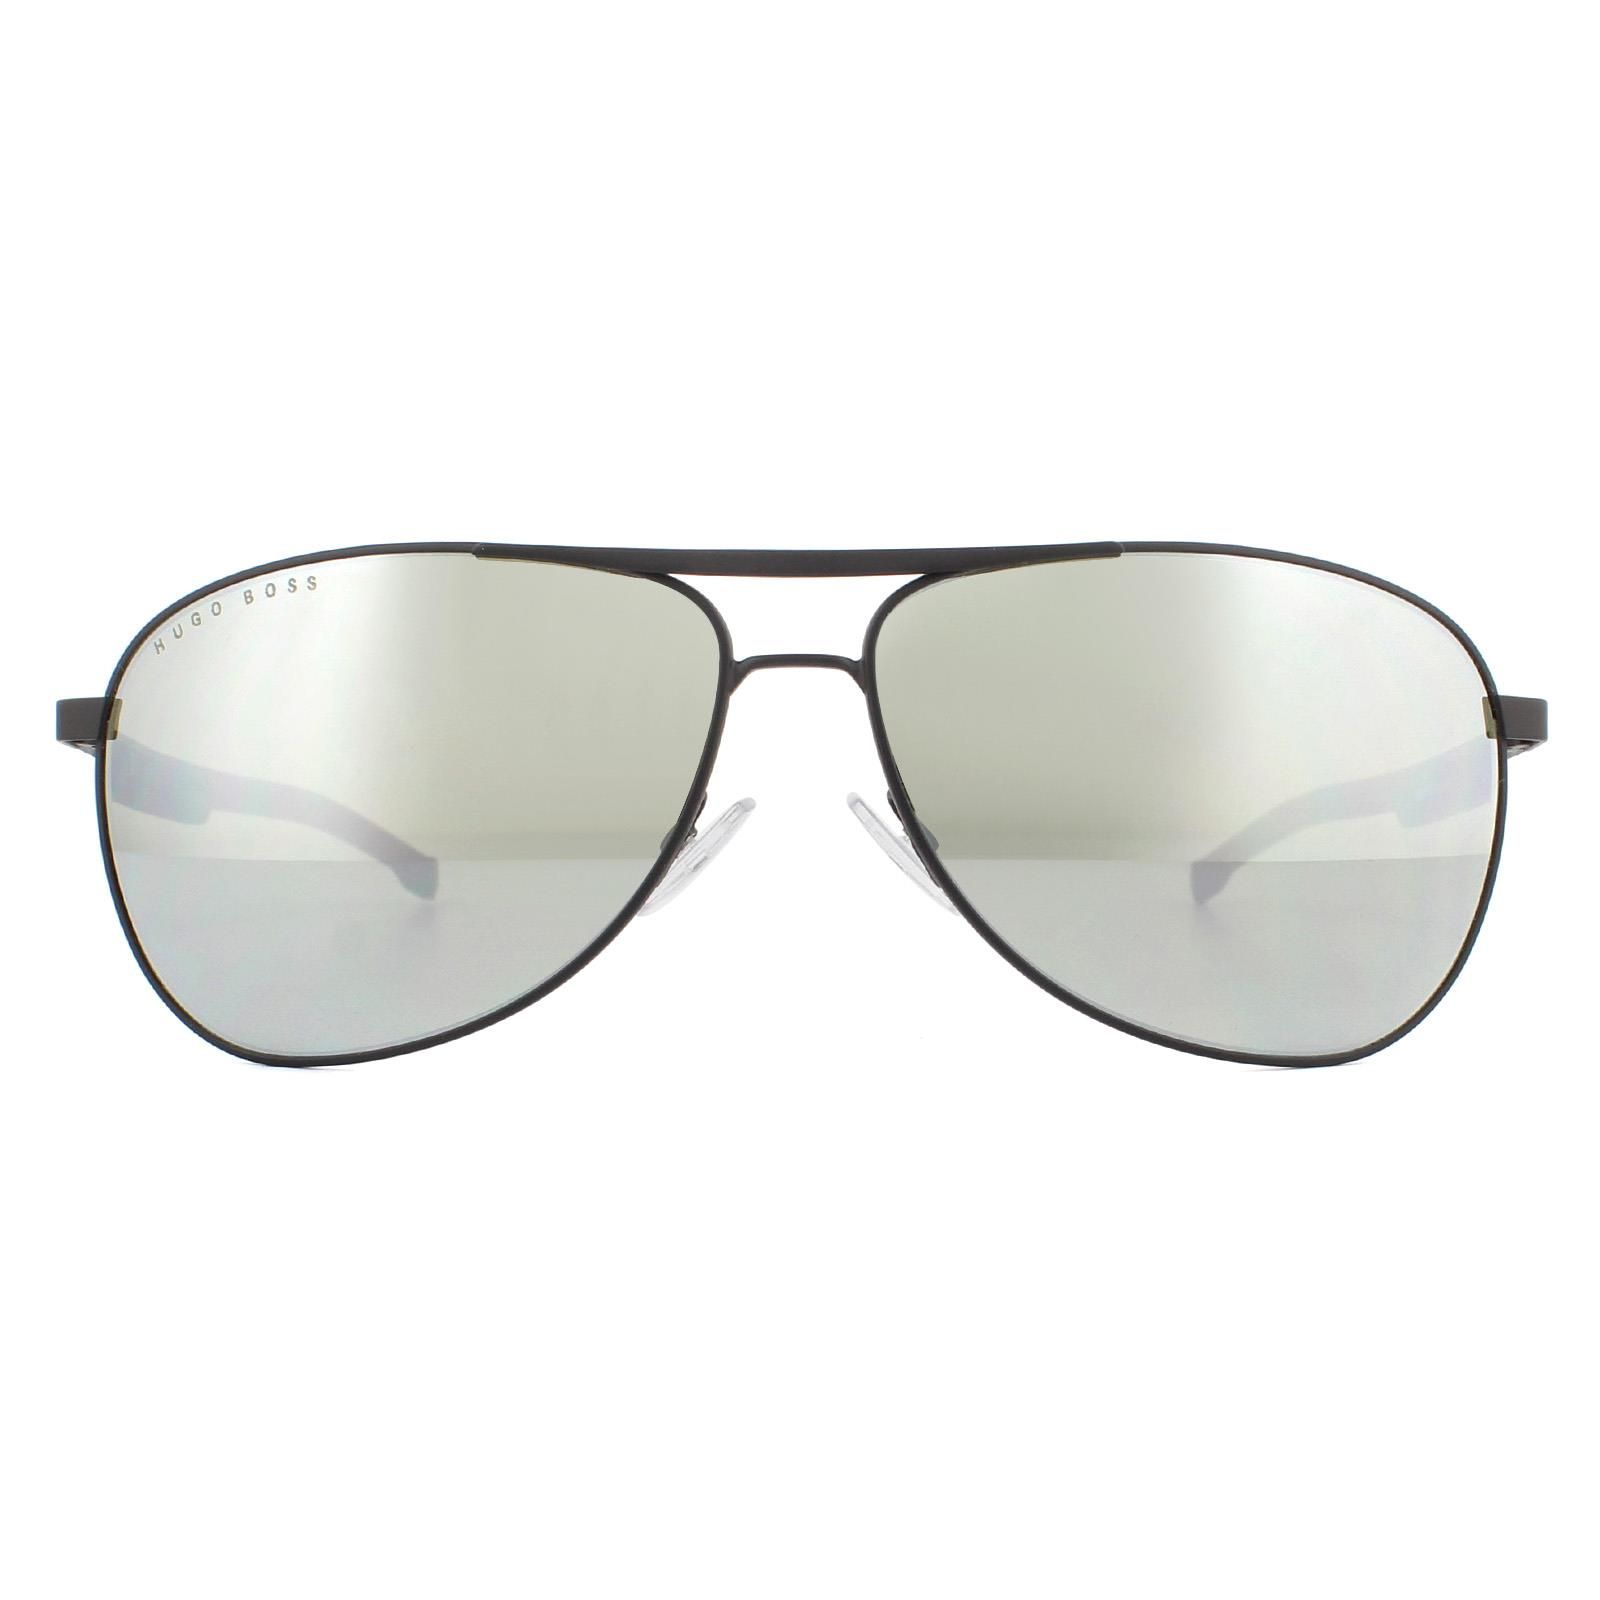 Hugo Boss Sunglasses BOSS 1199/N/S 003/T4 Matte Black Silver Mirror